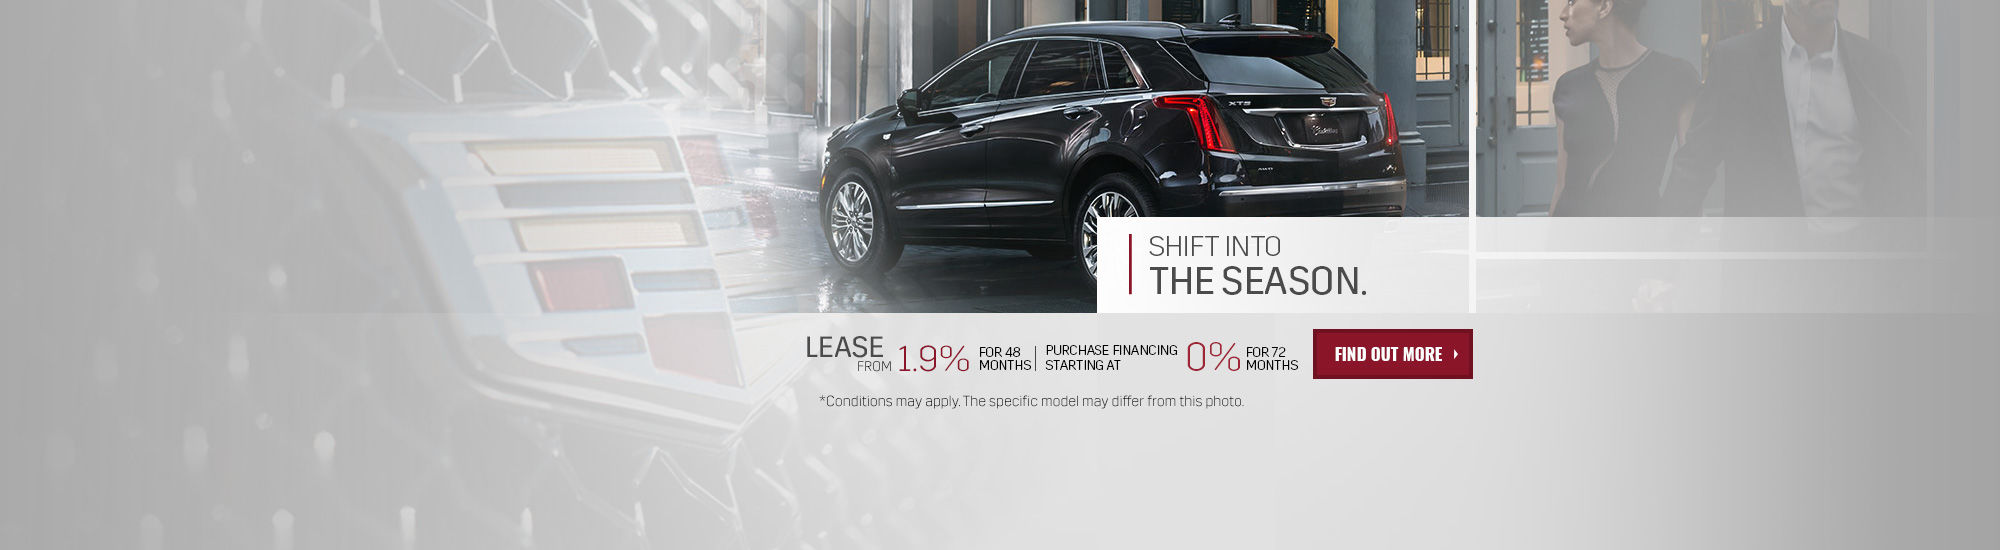 Cadillac - Shift into the Season